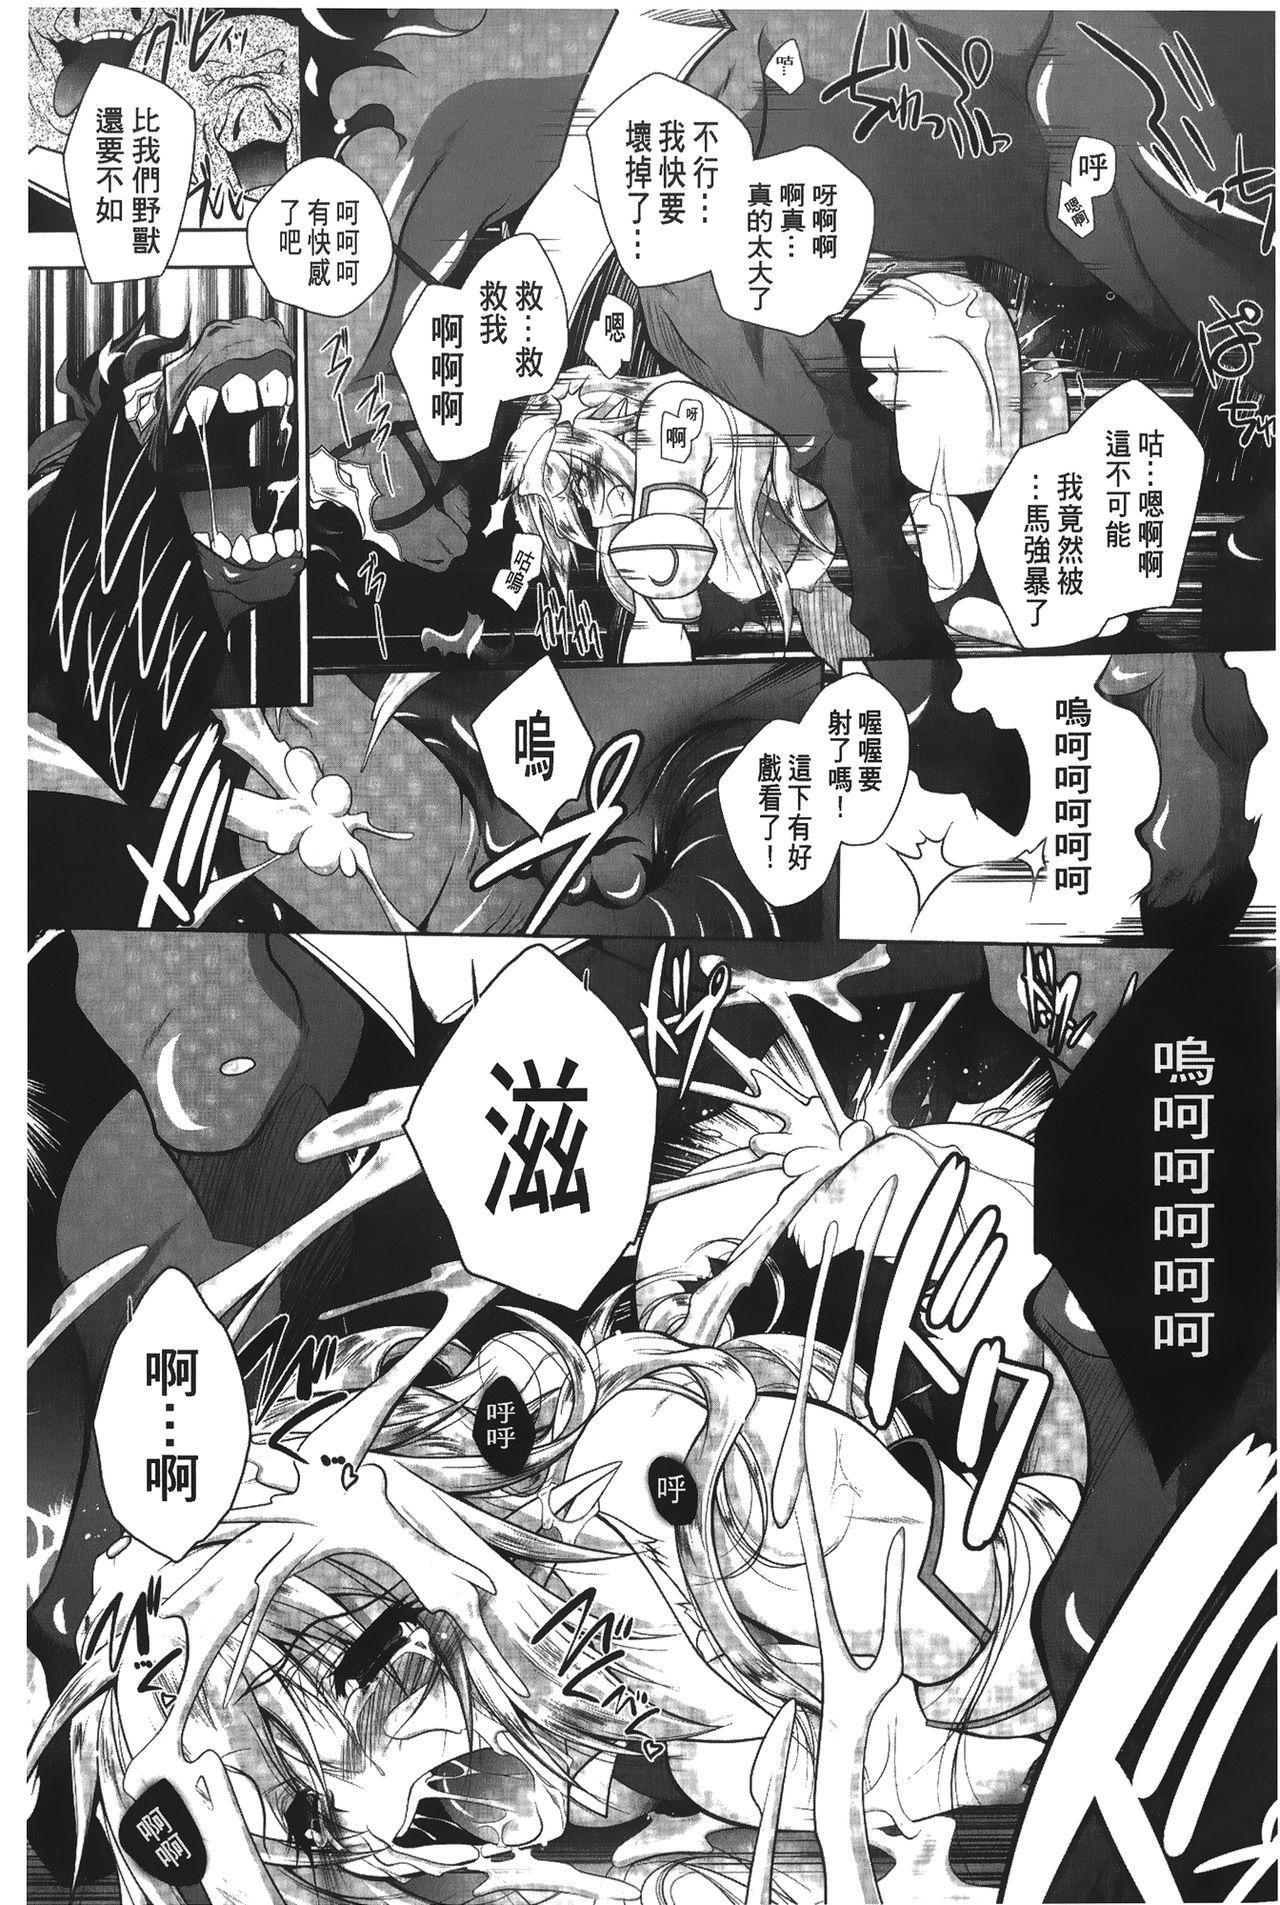 [Parfait] Datenshi-tachi no Rondo - Fallen Angels Rondo   墮天使們的圓舞曲 [Chinese] 42